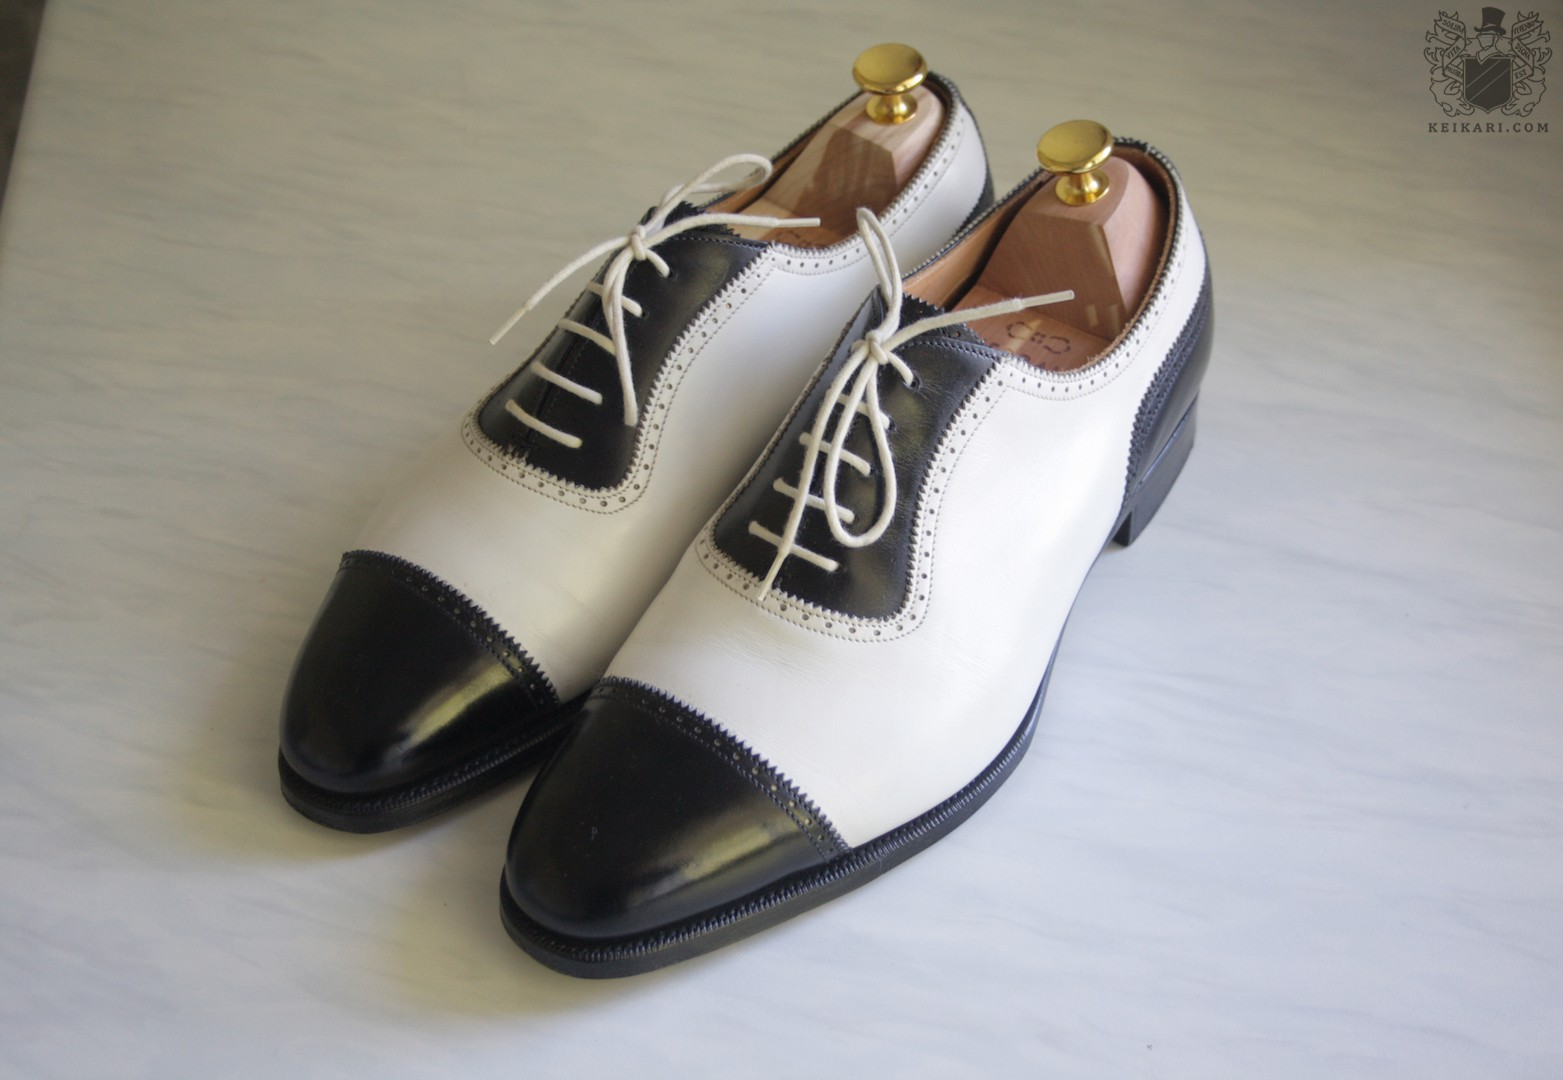 Edward_Green_blackwhite_prototype_spectator_shoes_from_Keikari_dot_com02.jpg